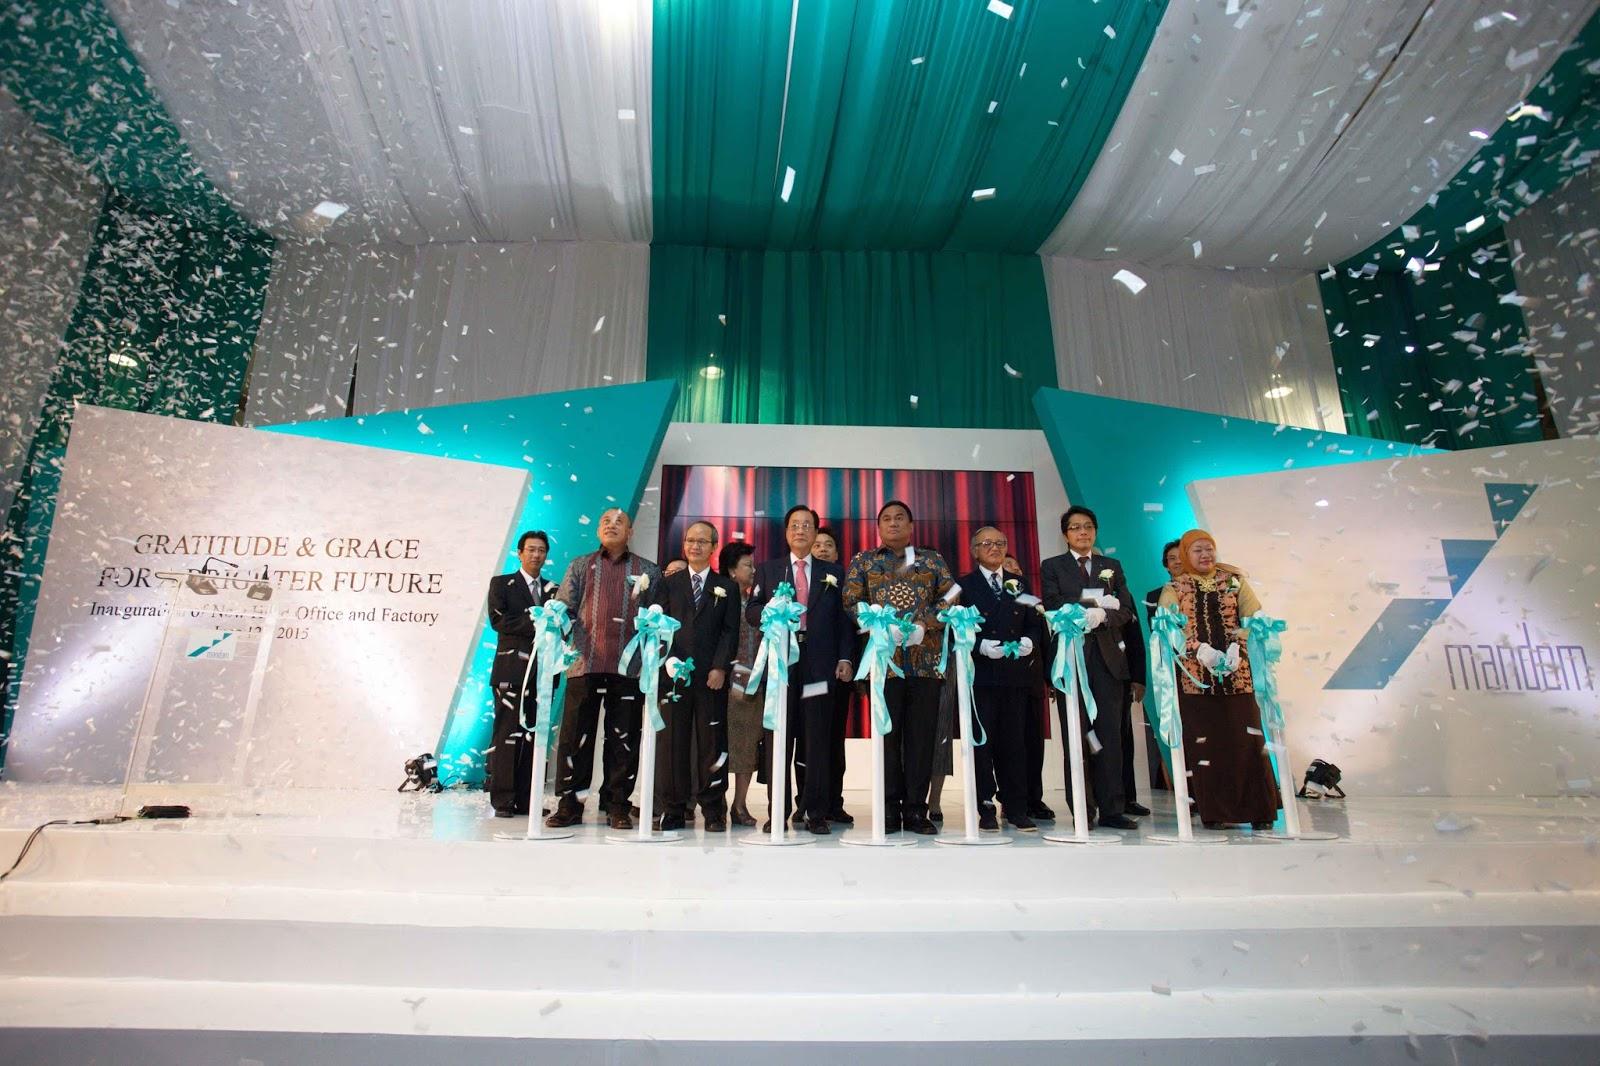 Lowongan Kerja PT. MANDOM INDONESIA TBK Kawasan MM2100 Bekasi